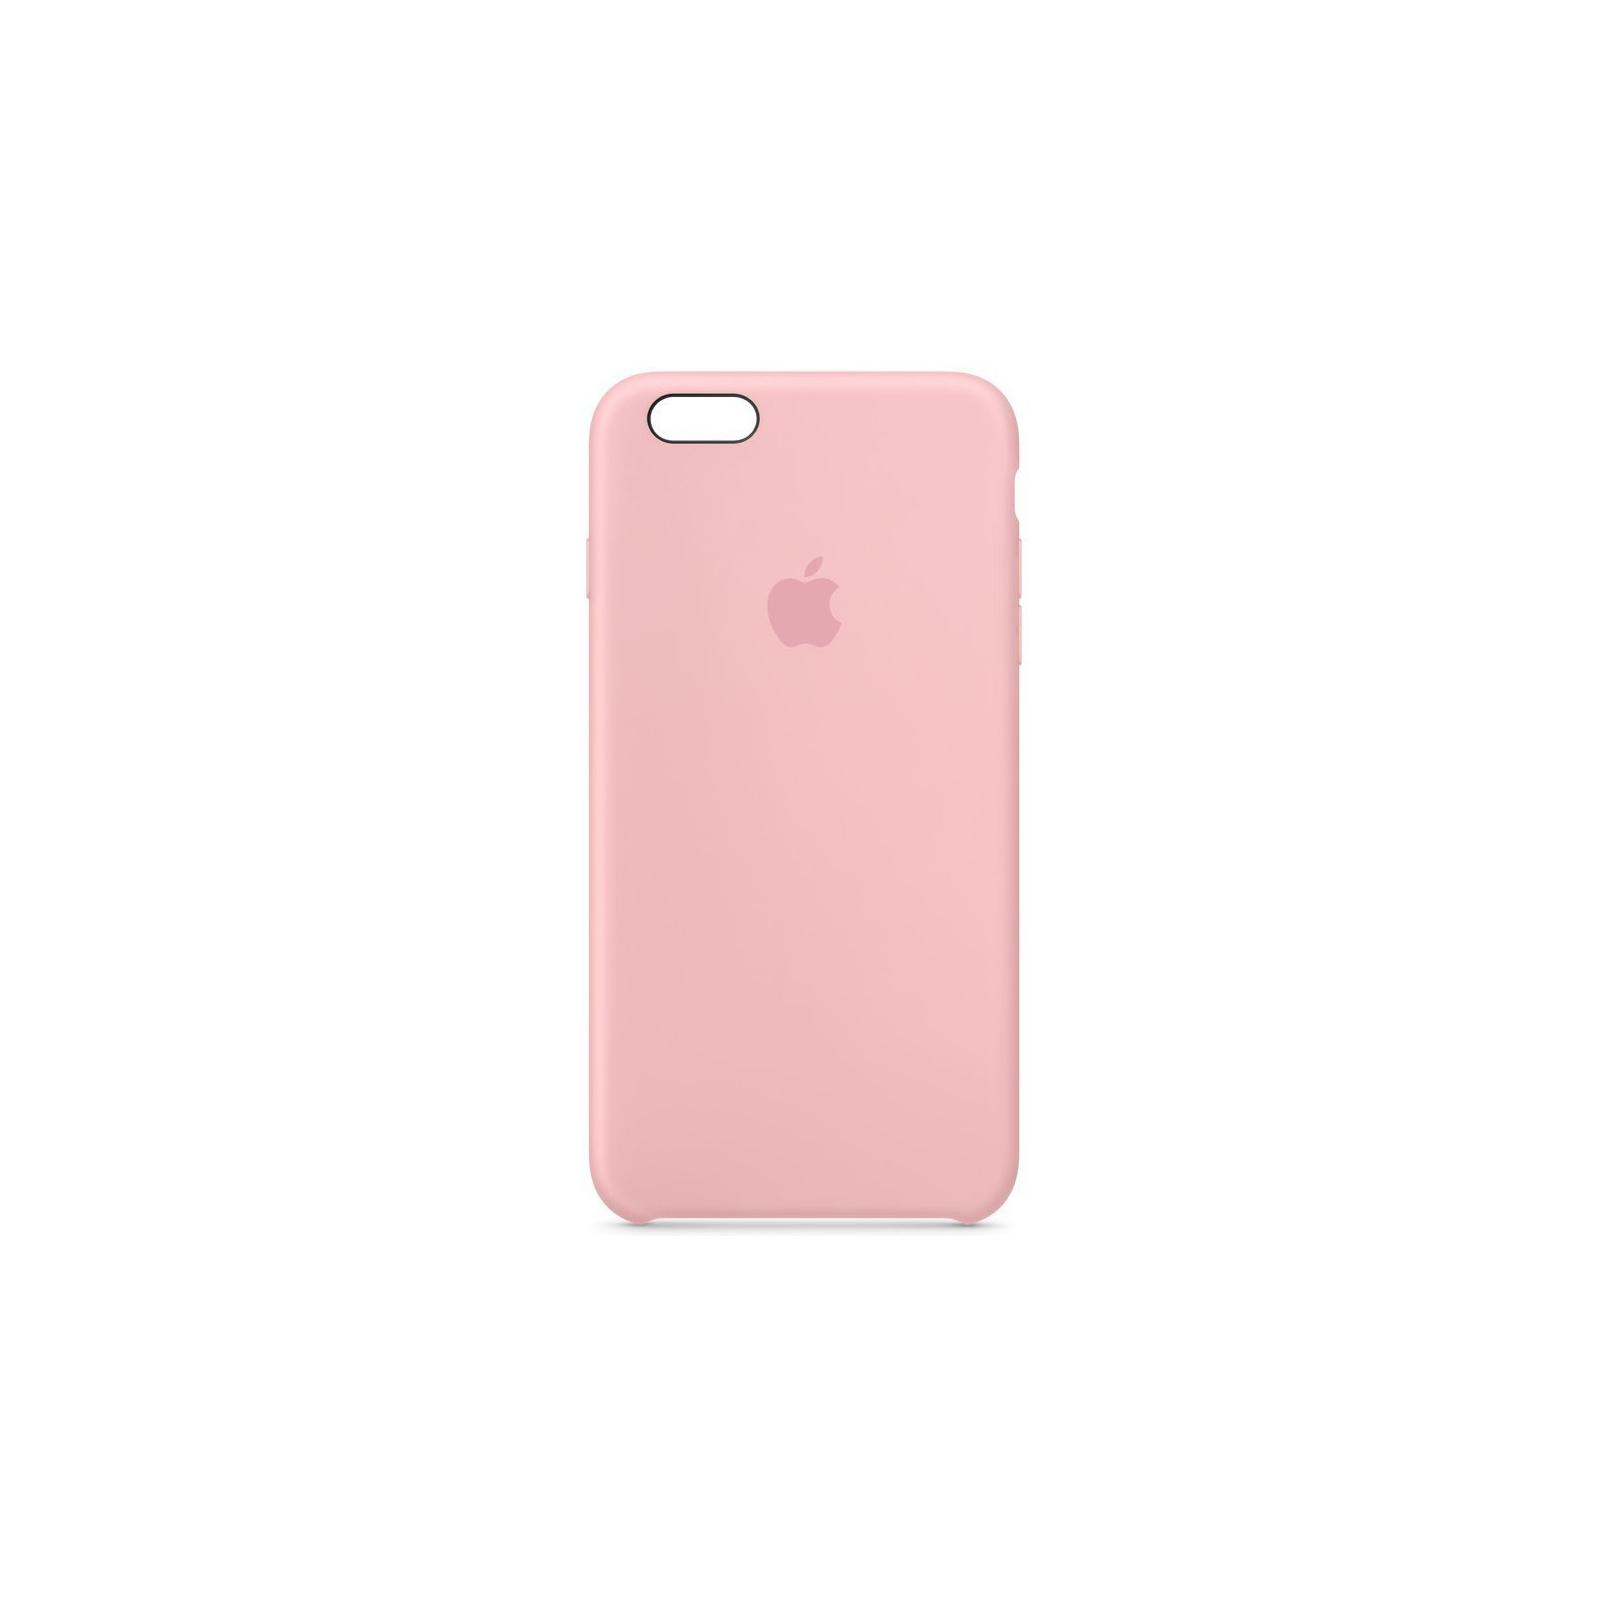 Чехол для моб. телефона Apple для iPhone 6 Plus/6s Plus Pink (MLCY2ZM/A)